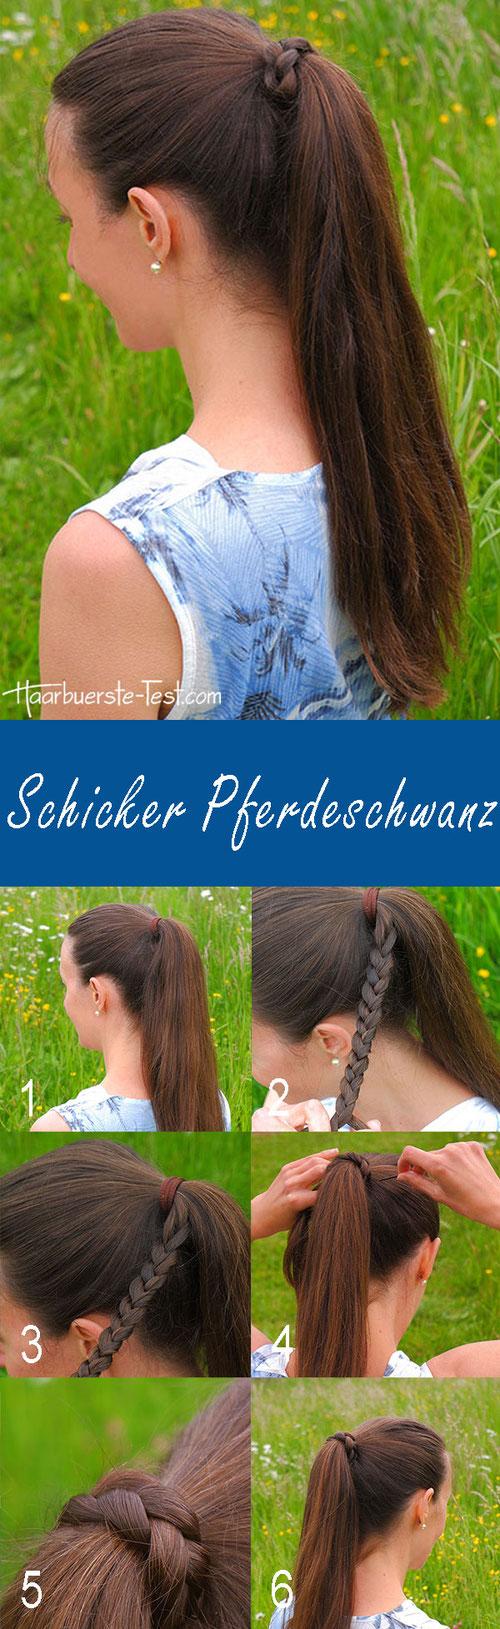 eleganter Pferdeschwanz, Pferdeschwanz Anleitung, Anleitung Pferdeschwanz